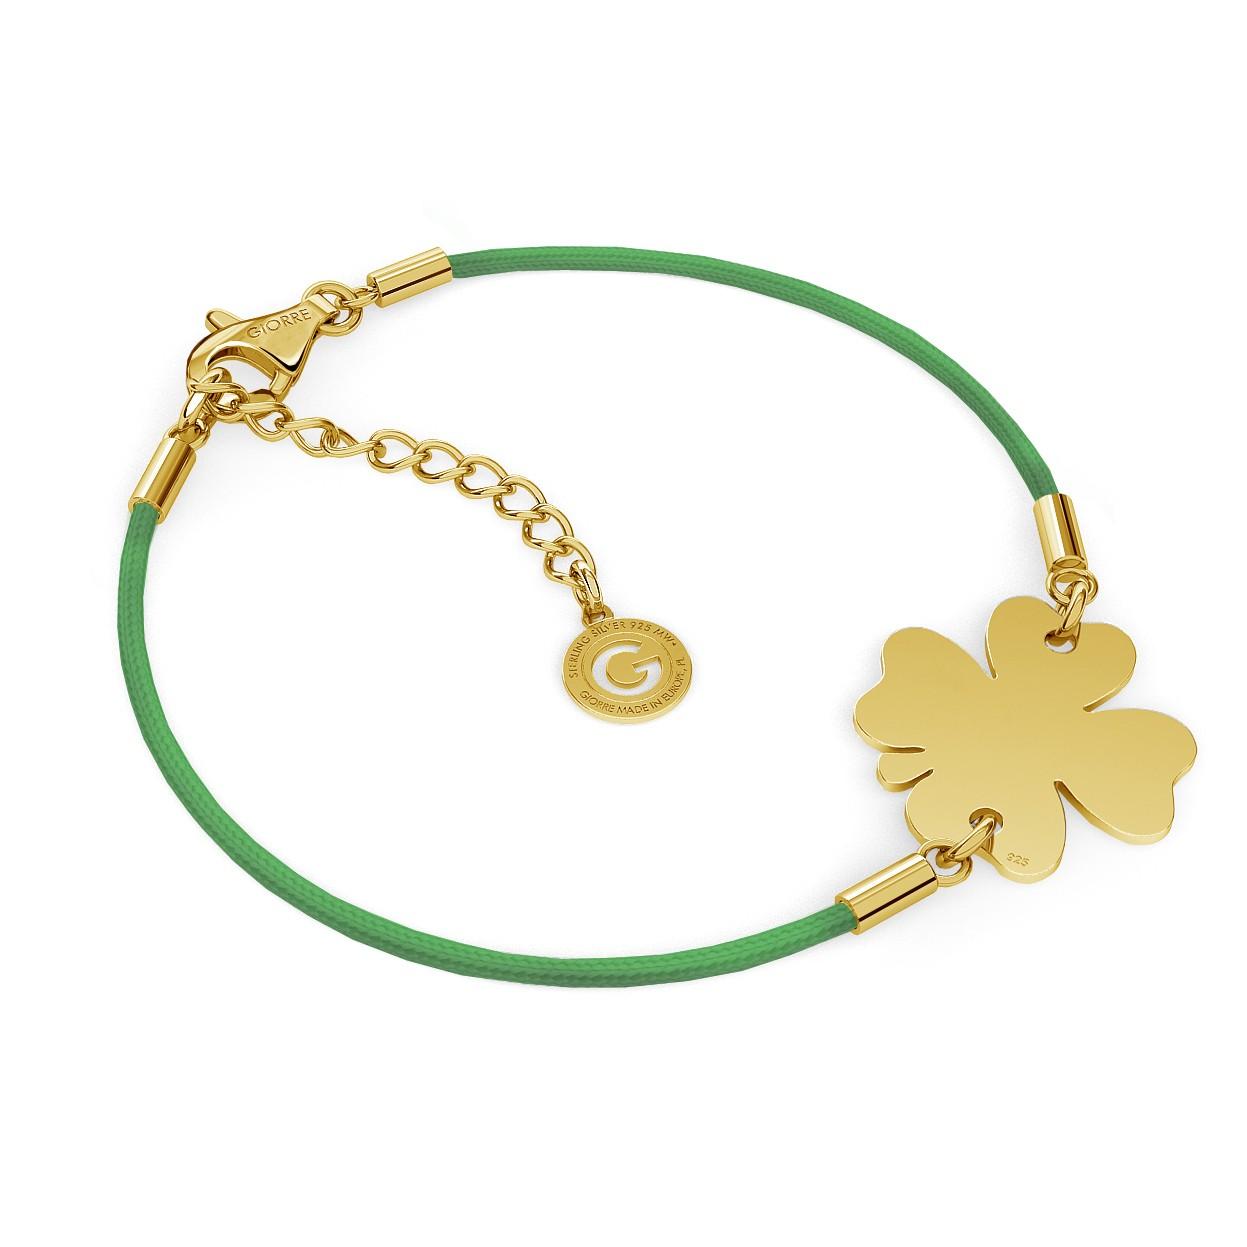 Personalized clover bracelet